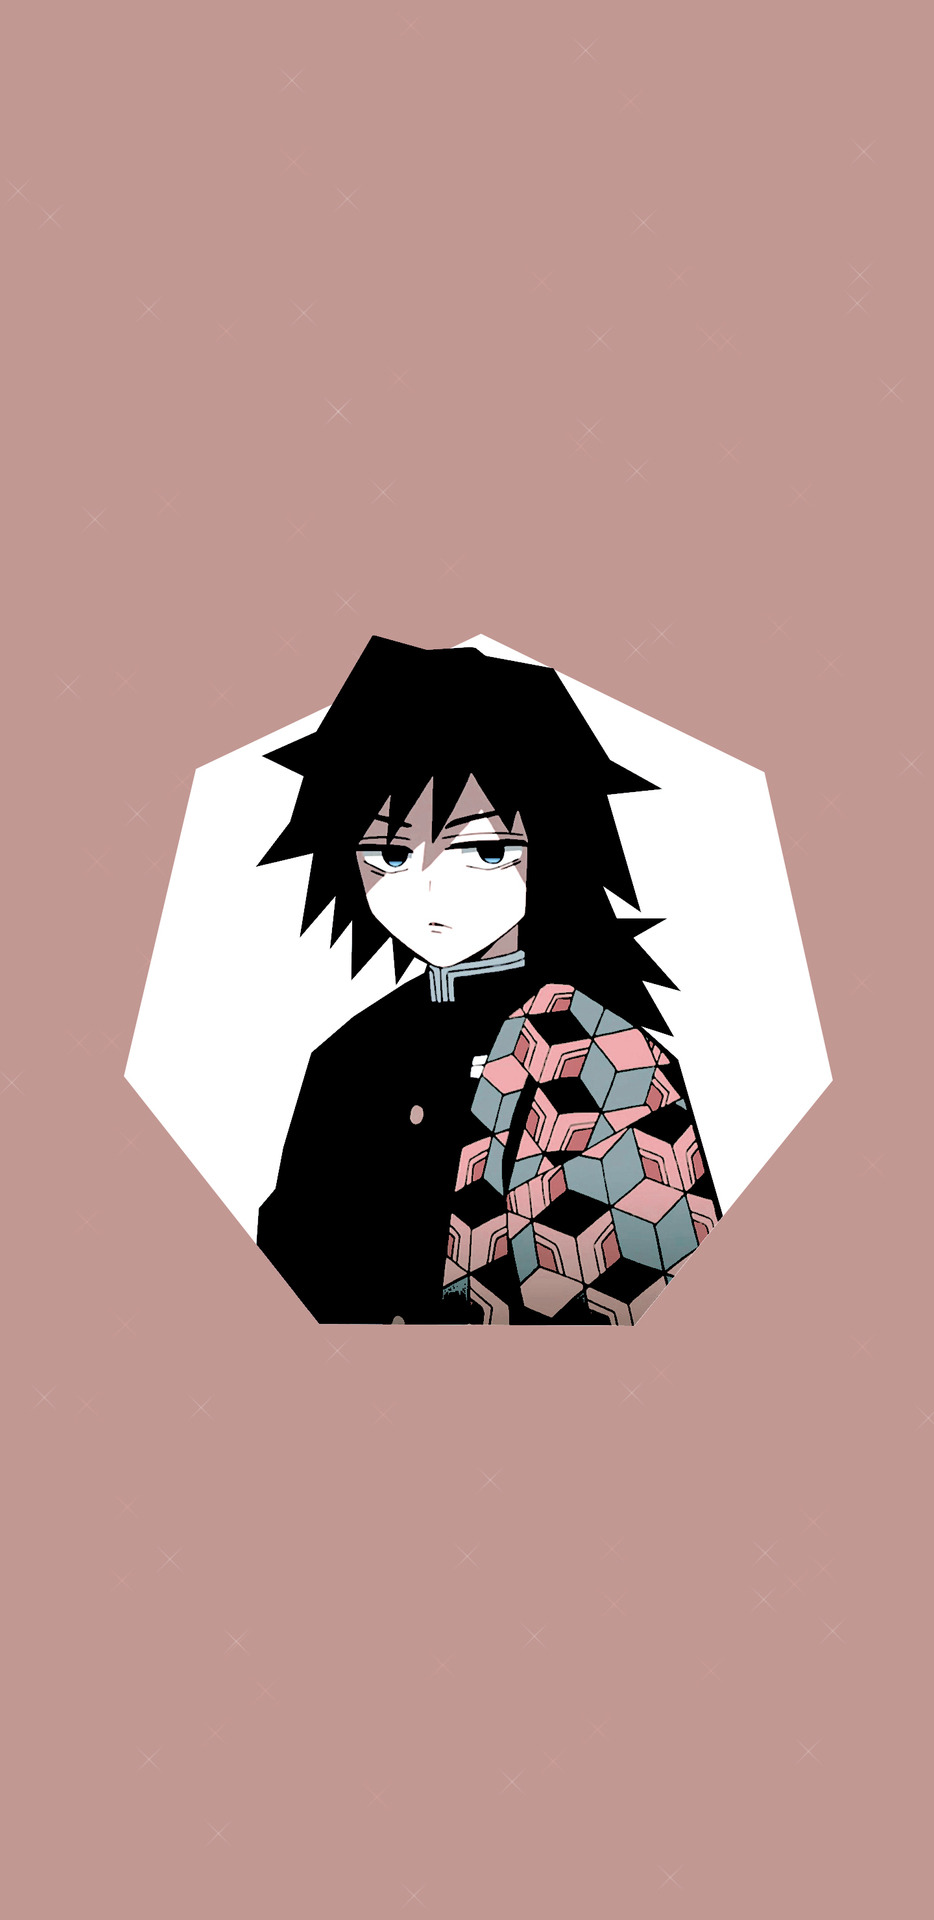 Demon Slayer Lockscreen Wallpaper Hd In 2021 Anime Picture Hd Anime Monochrome Cute Anime Wallpaper